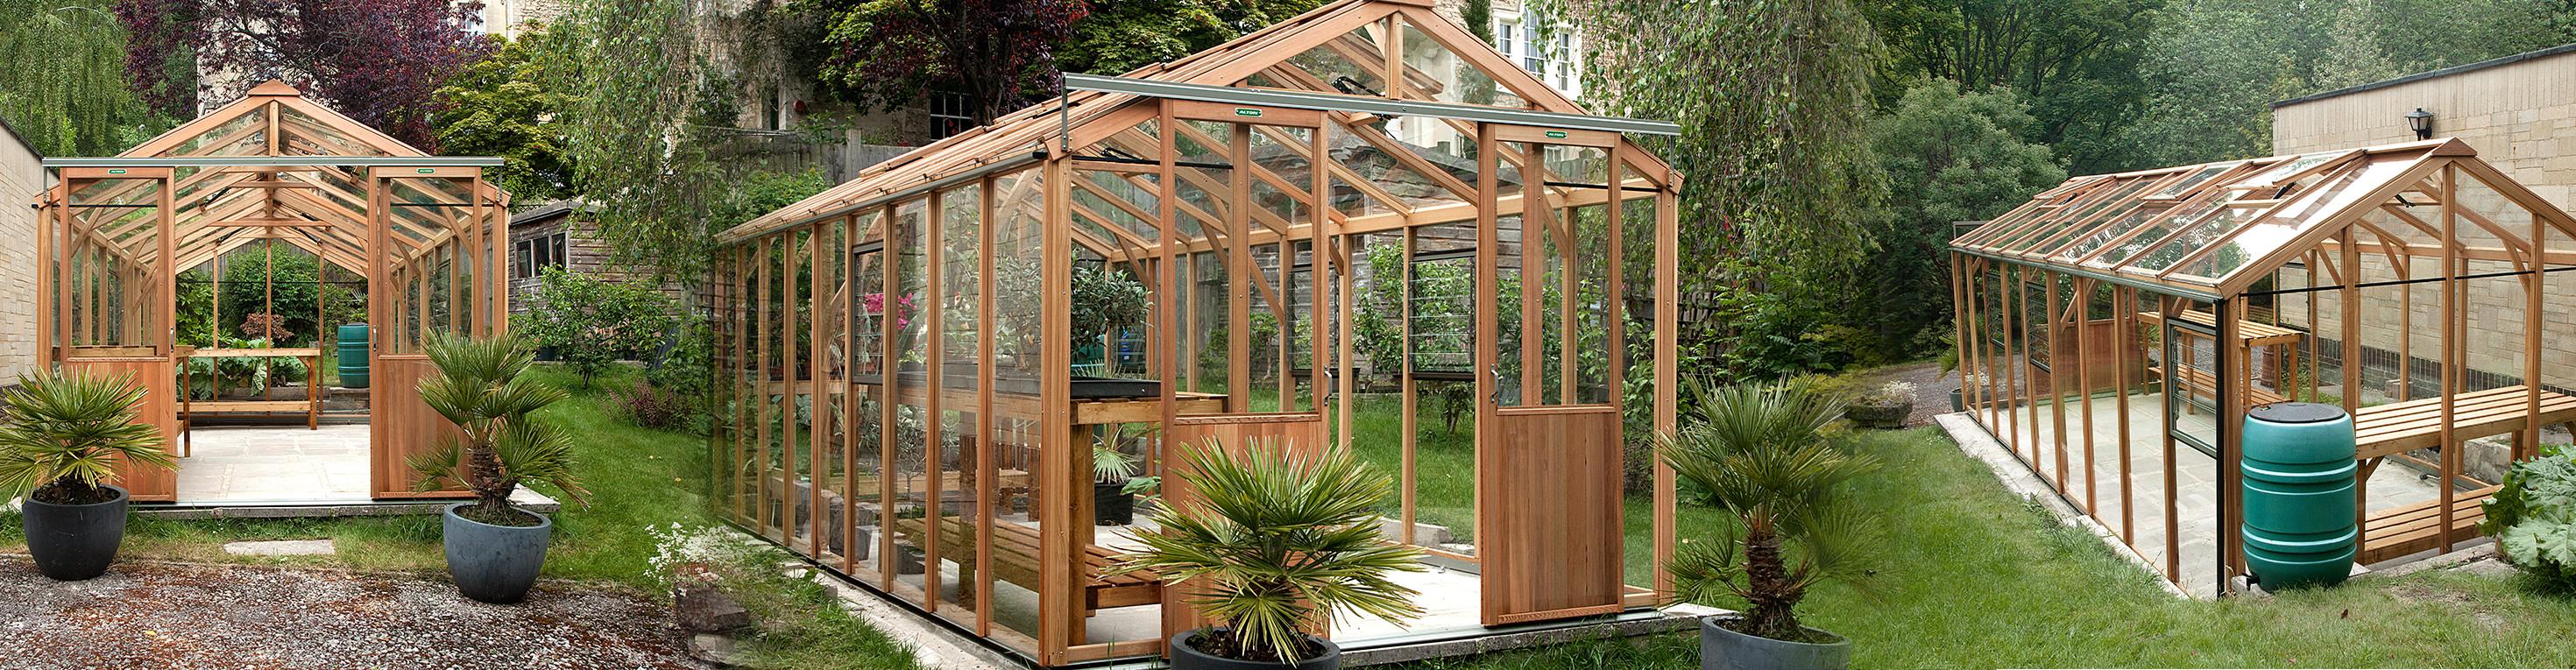 Alton greenhouses